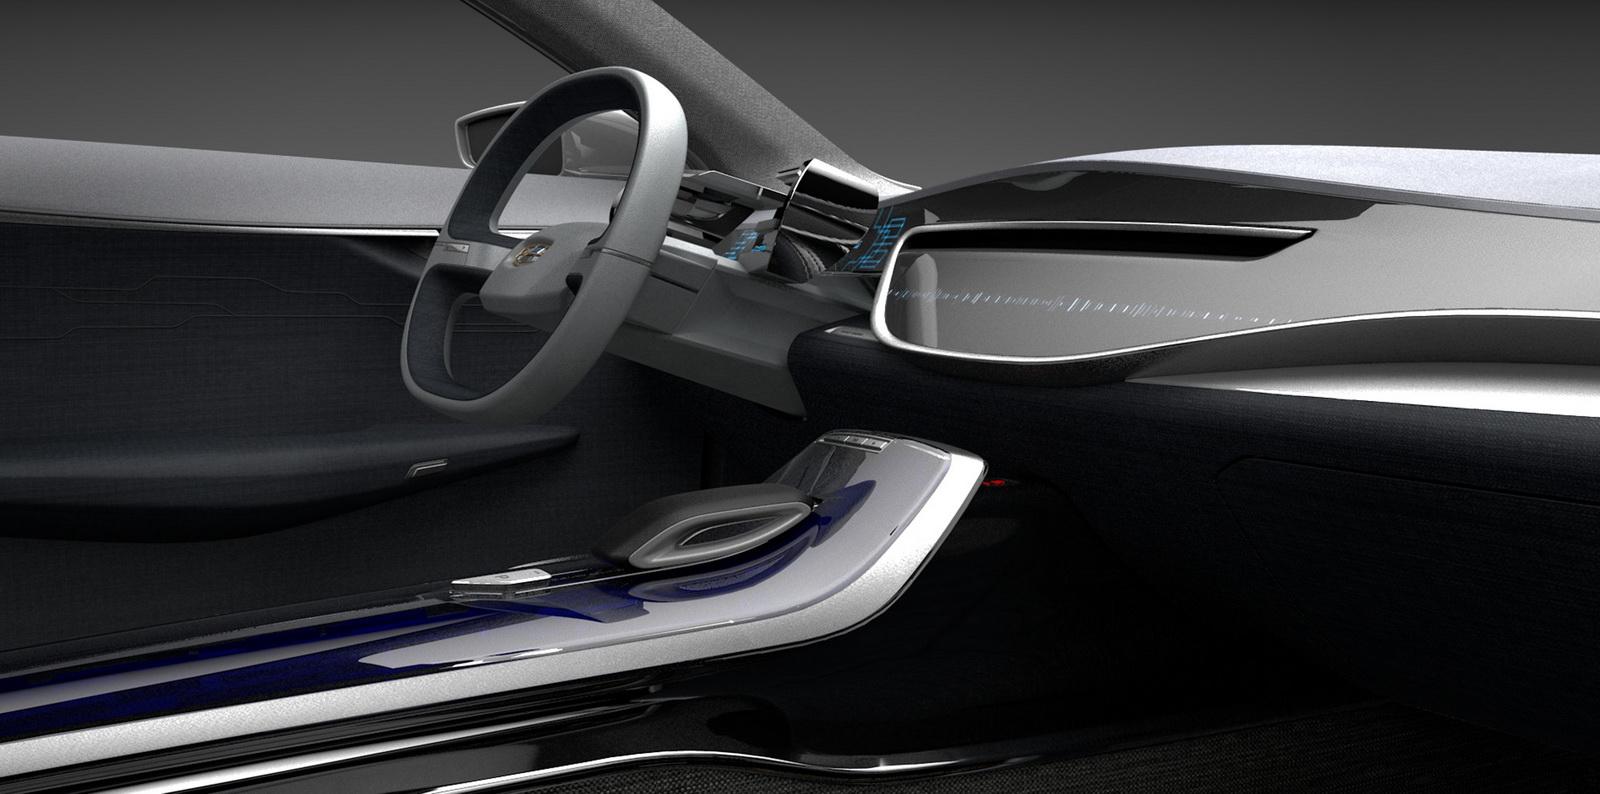 2015 - [Chine] Salon Auto de Shanghai - Page 2 2015-Geely-Emgrand-Concept-03